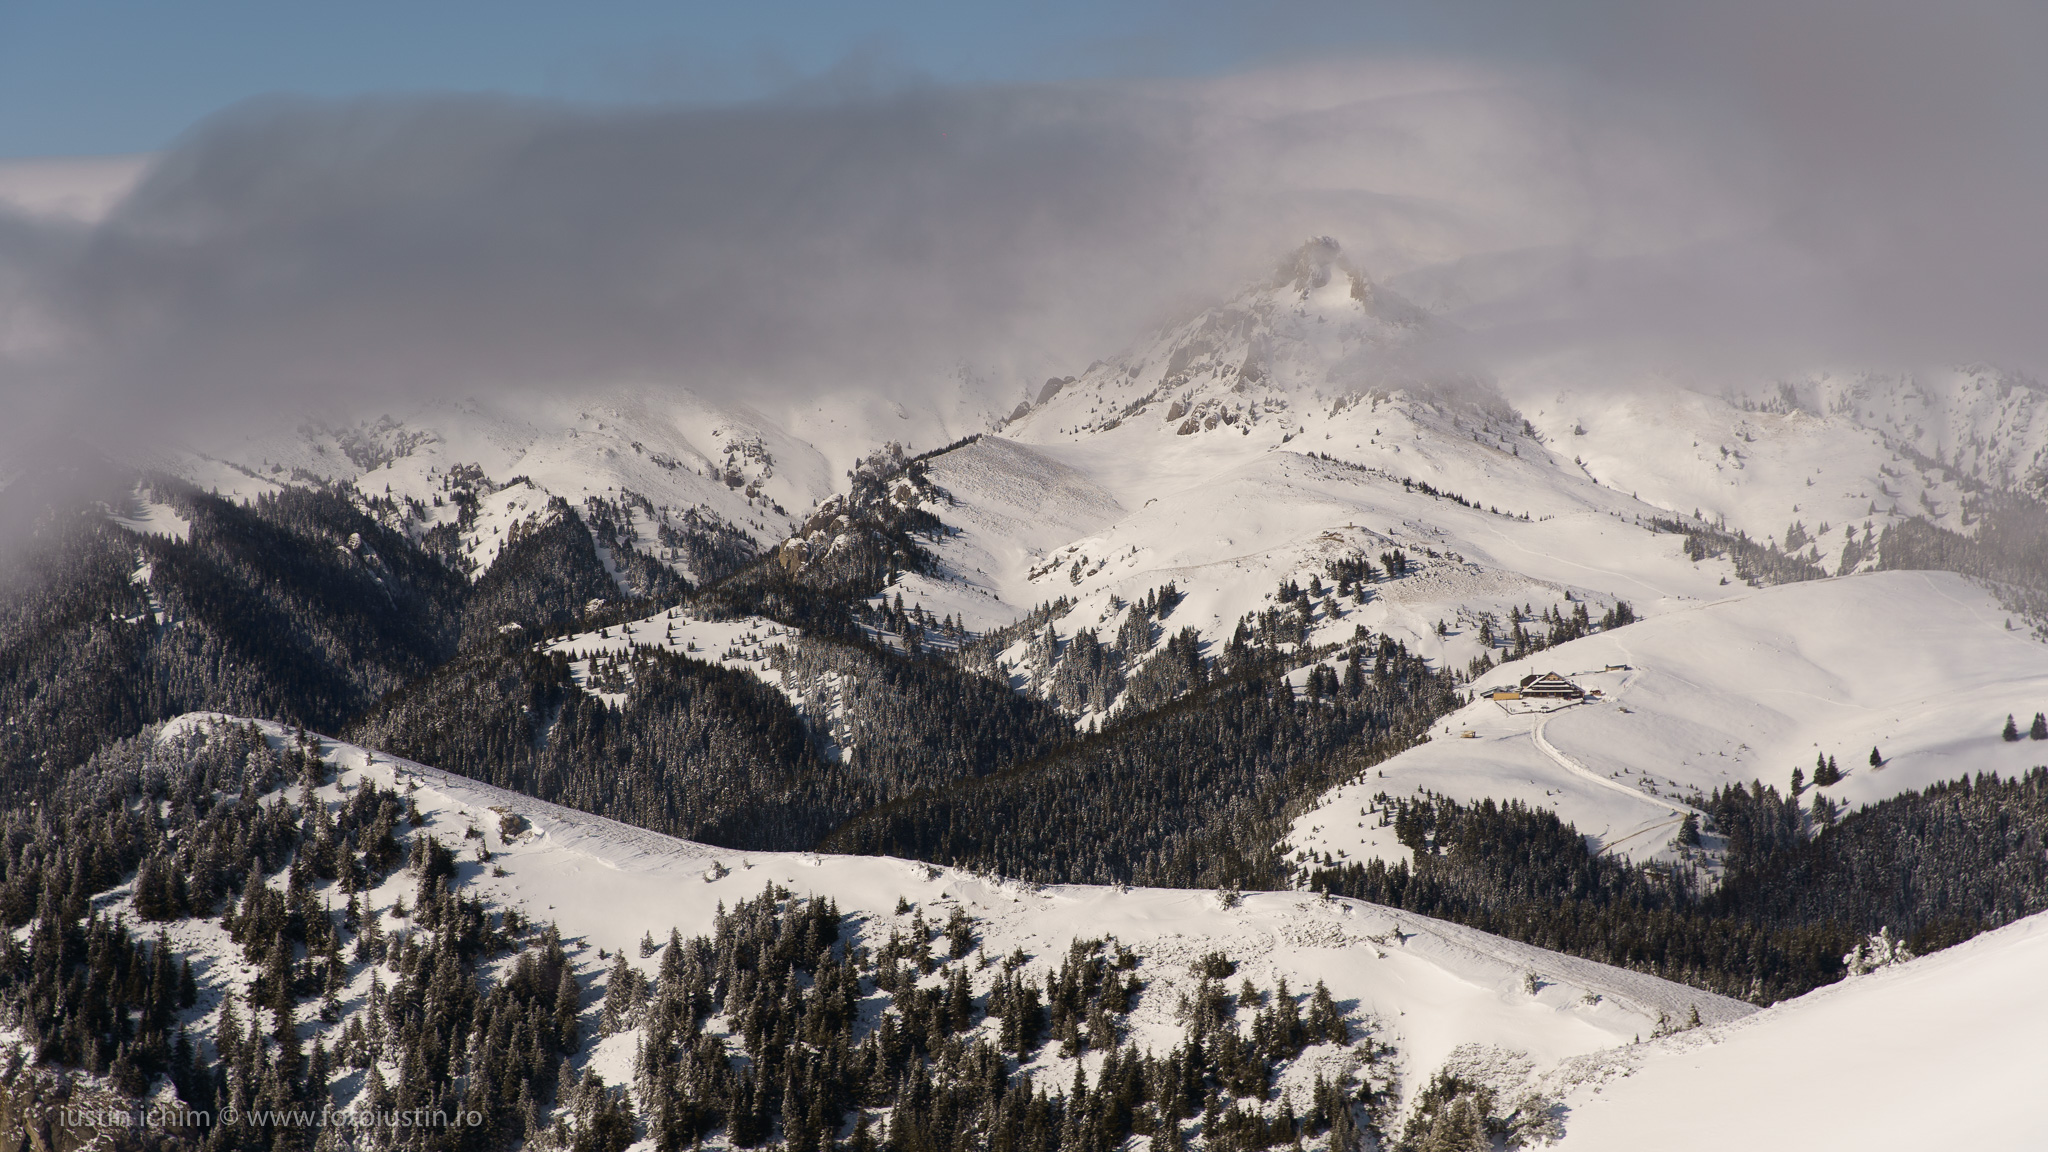 Munții Ciucaș, Vf. Ciucaș iarna